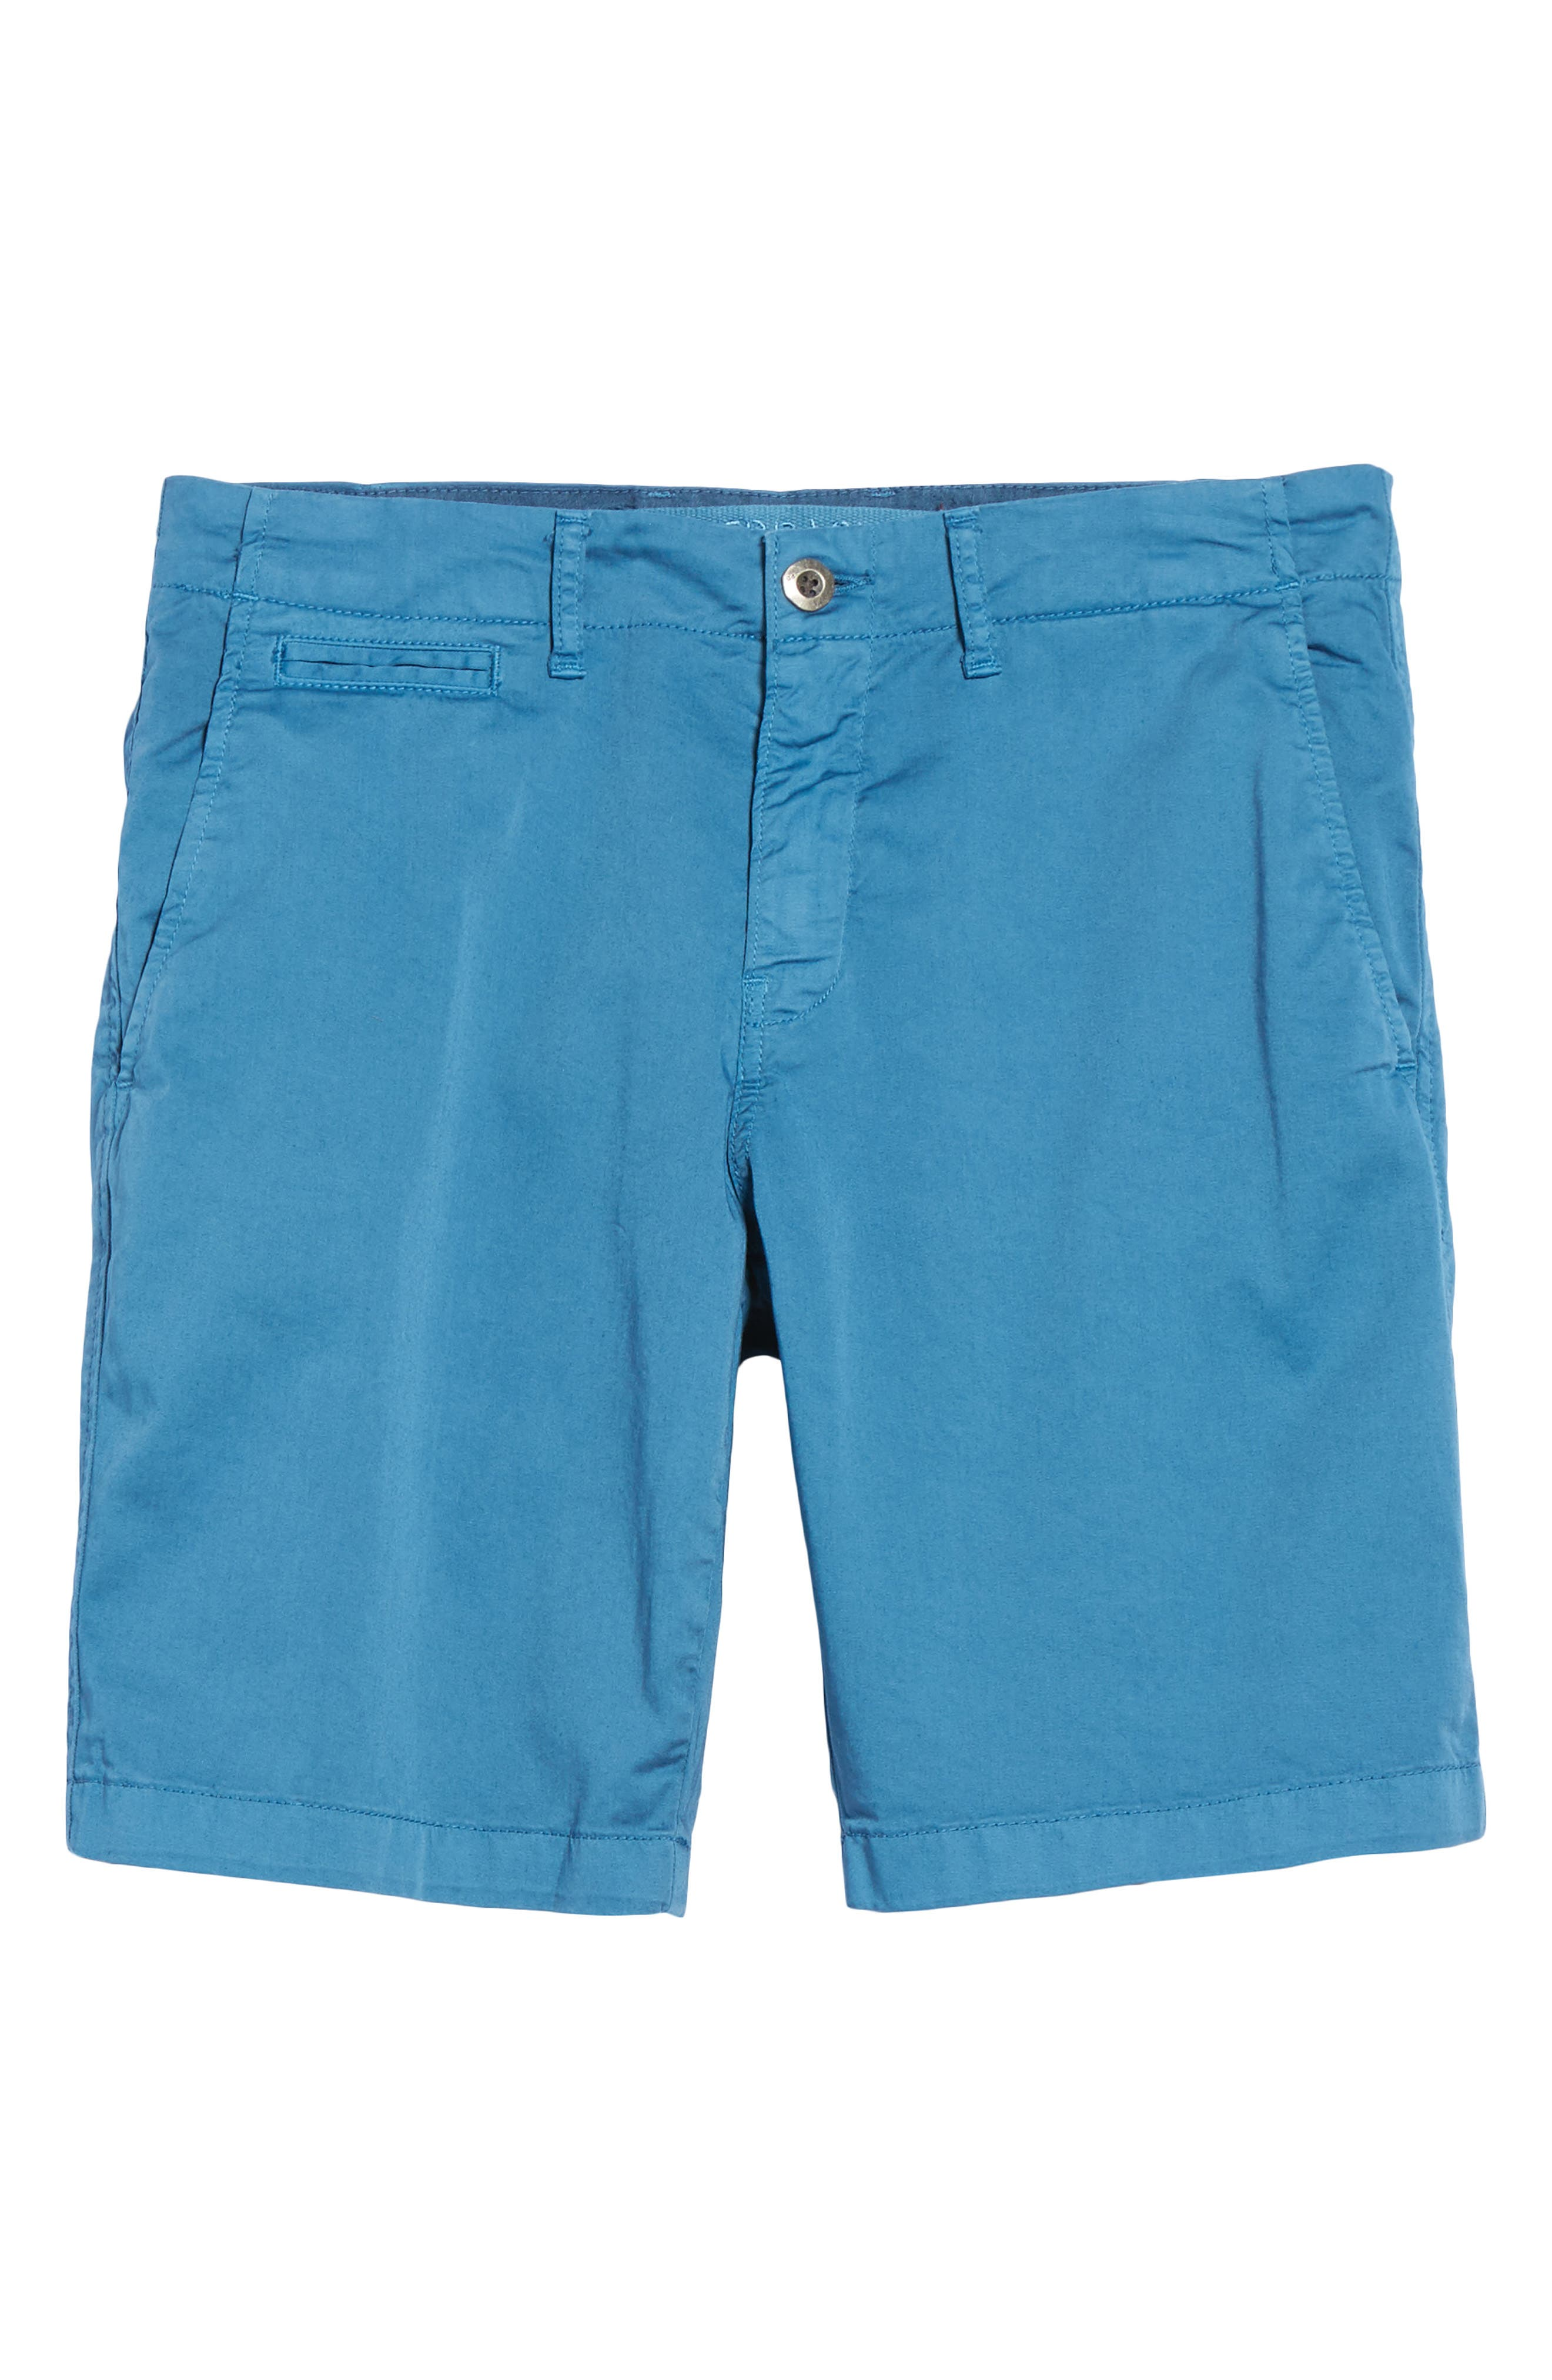 St. Barts Twill Shorts,                             Alternate thumbnail 70, color,